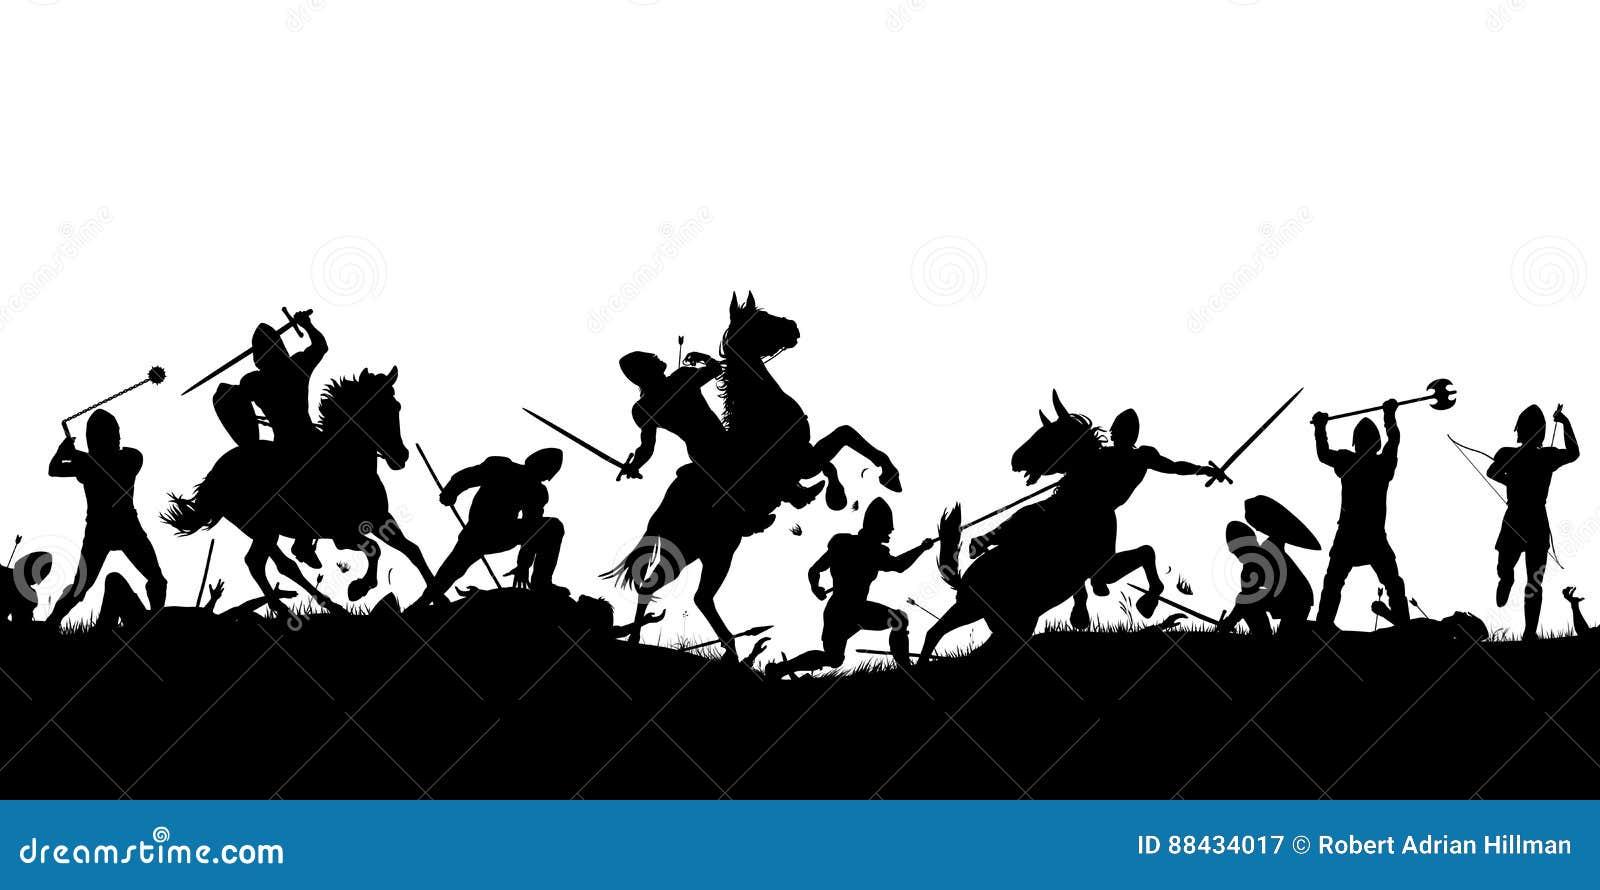 battle cartoons  illustrations   vector stock images spartans clipart gif spartan clipart logo